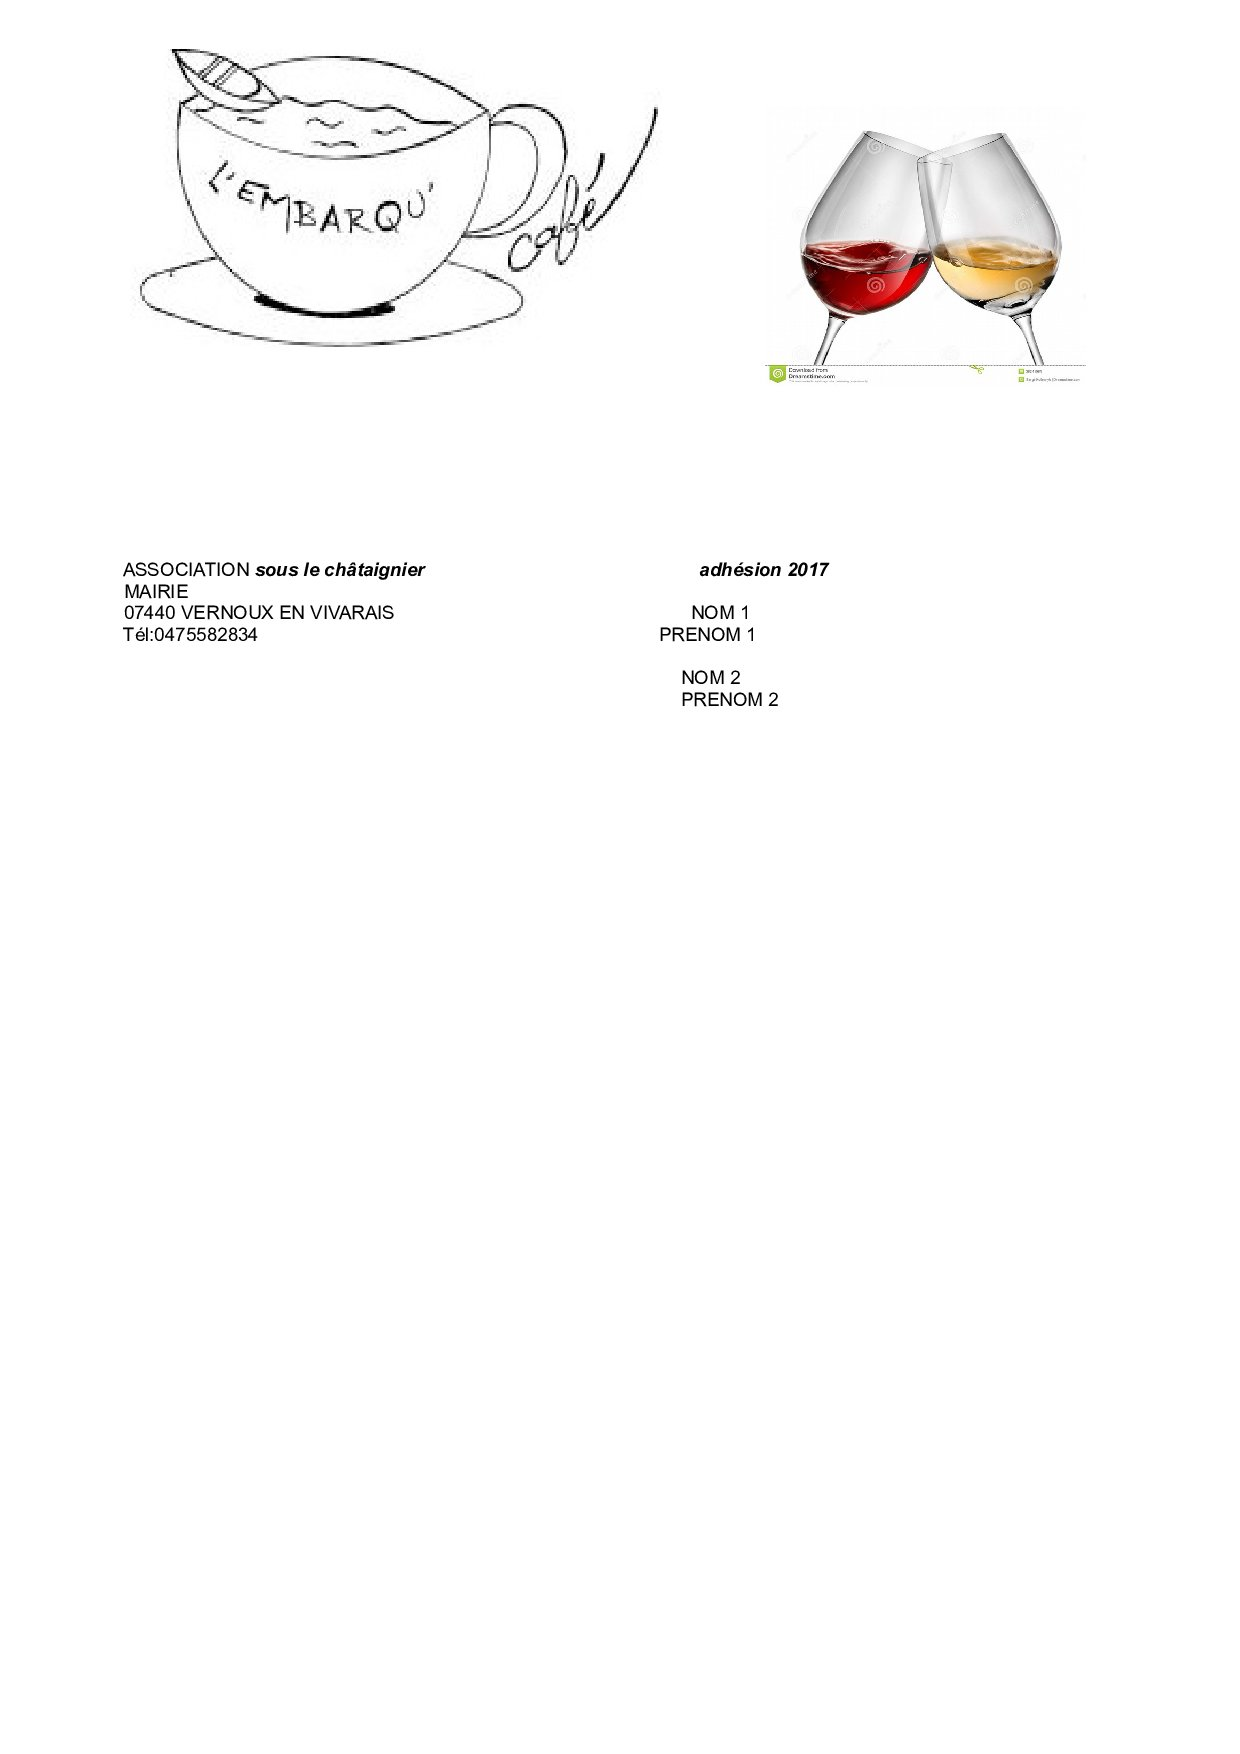 contrep2-1475664379.jpg